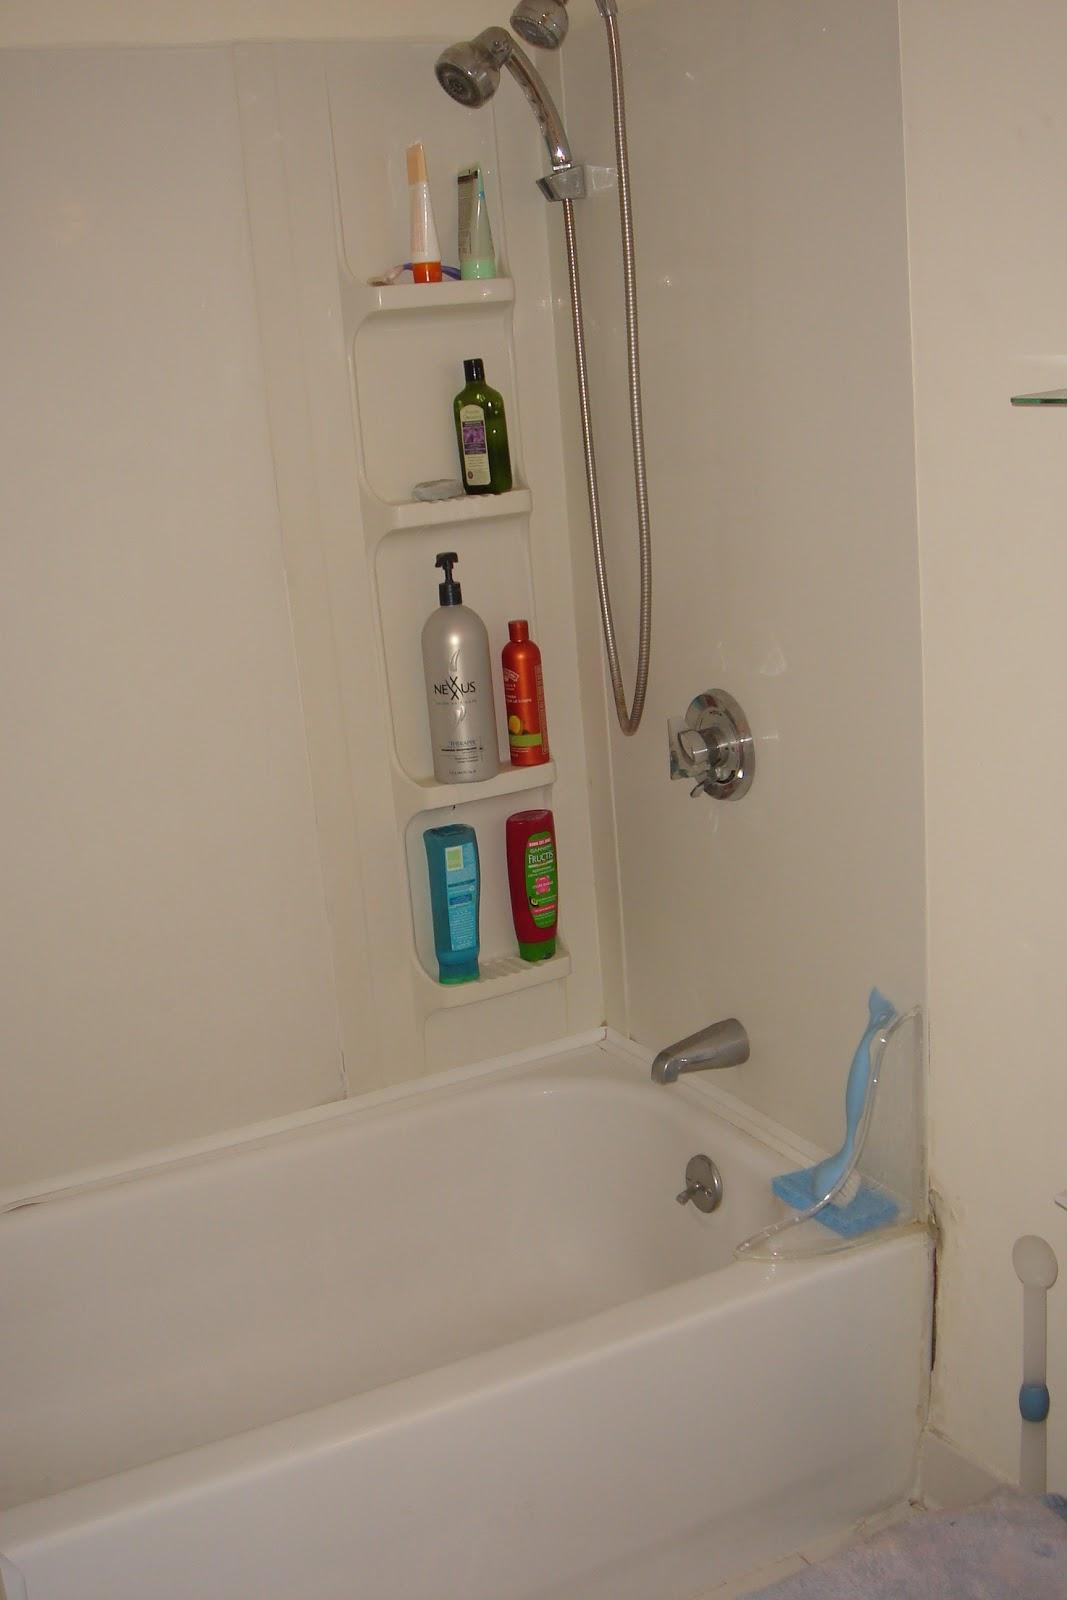 30 and Counting: Bath Tub Renovation